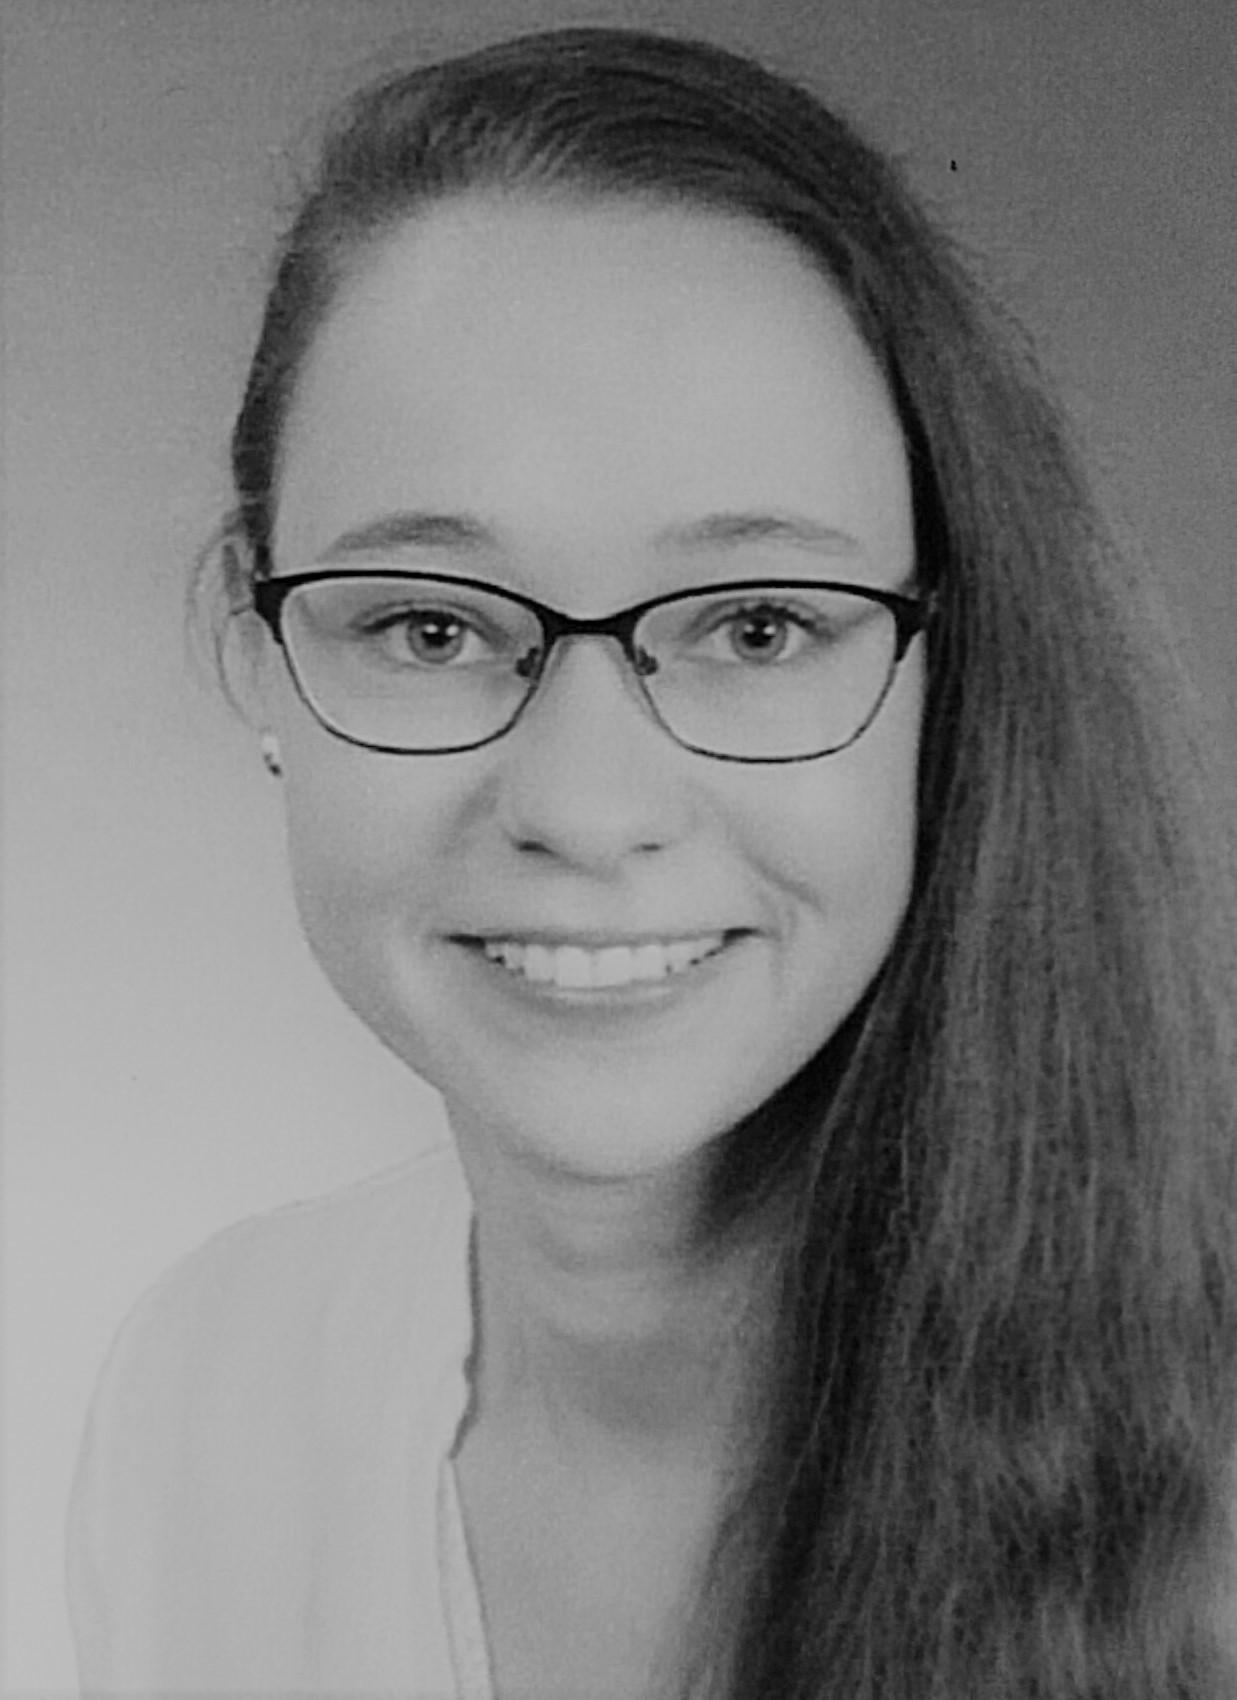 Discussion on this topic: Gina DeVettori, johanna-baer/